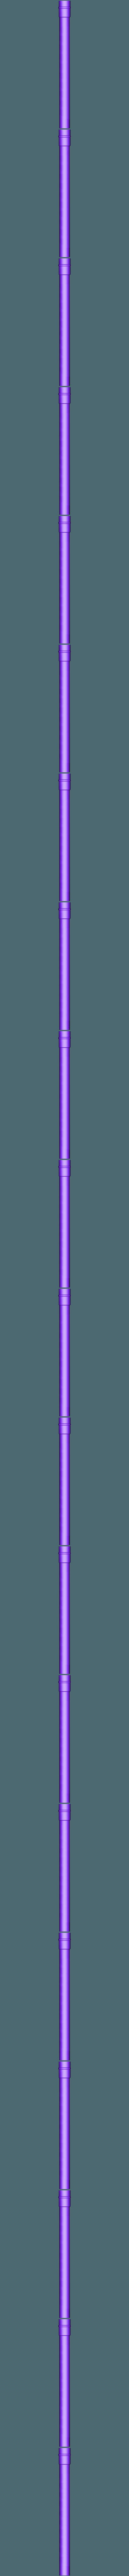 STL_S5_v20_Bottom_Barrell_.stl Download free STL file Star Wars Naboo S5 Heavy Blaster Pistol • 3D printing design, Dsk